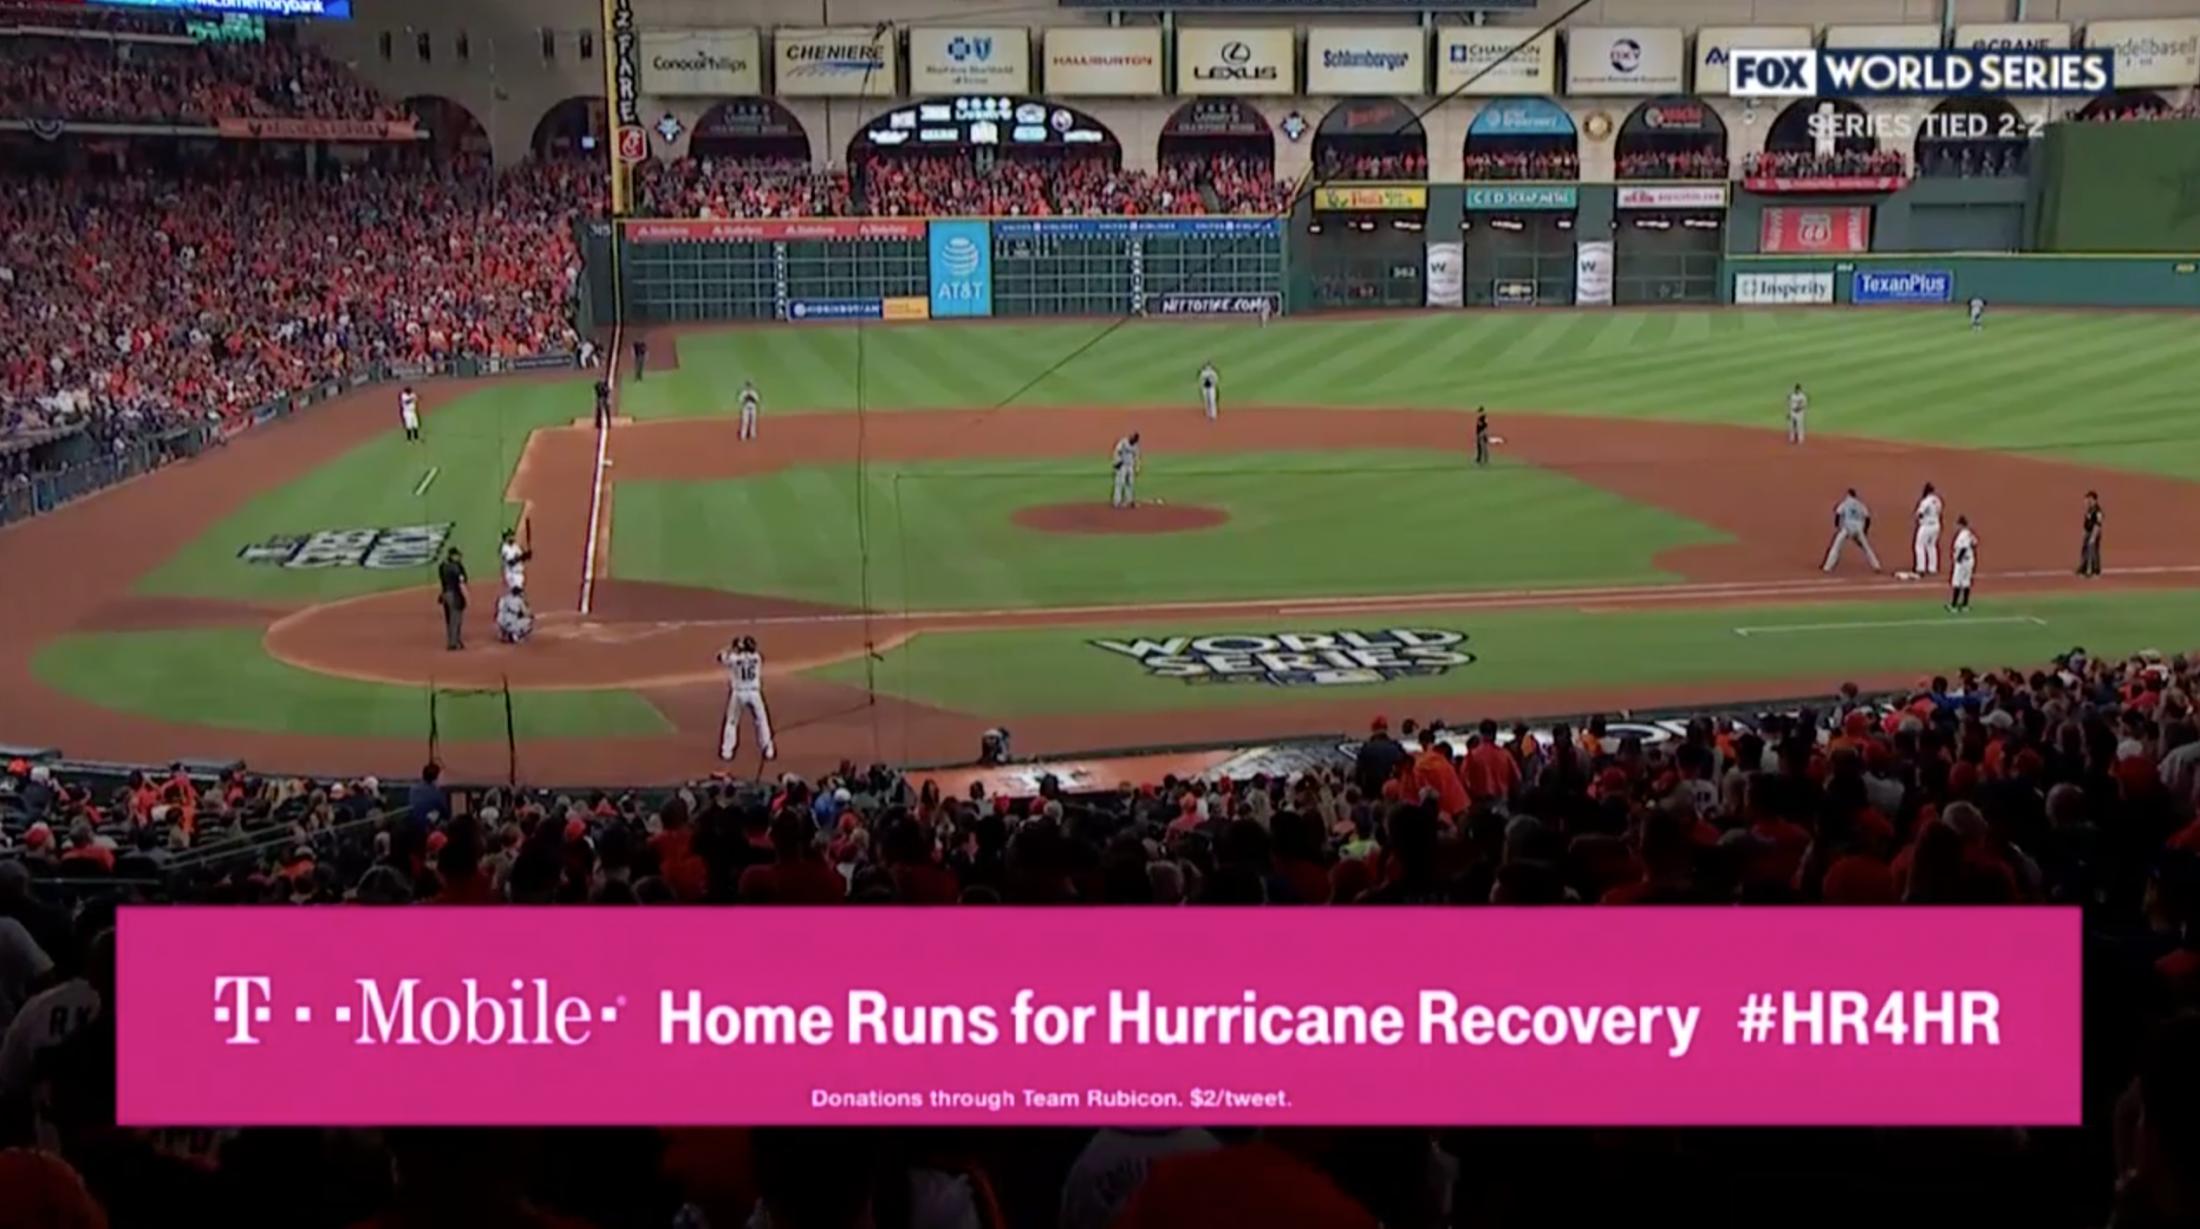 Thumbnail for World Series #HR4HR